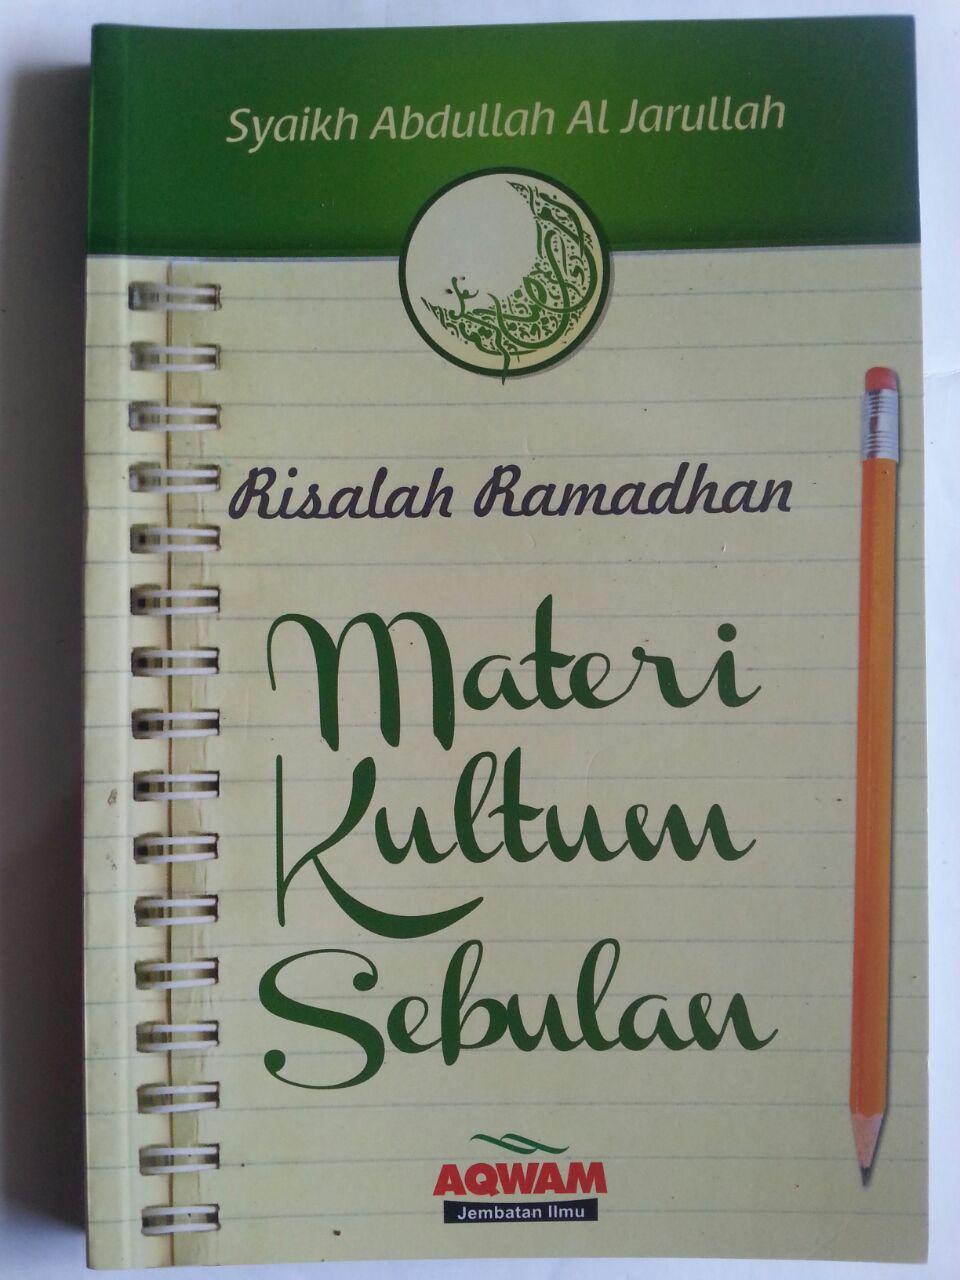 Buku Risalah Ramadhan Materi Kultum Sebulan cover 2